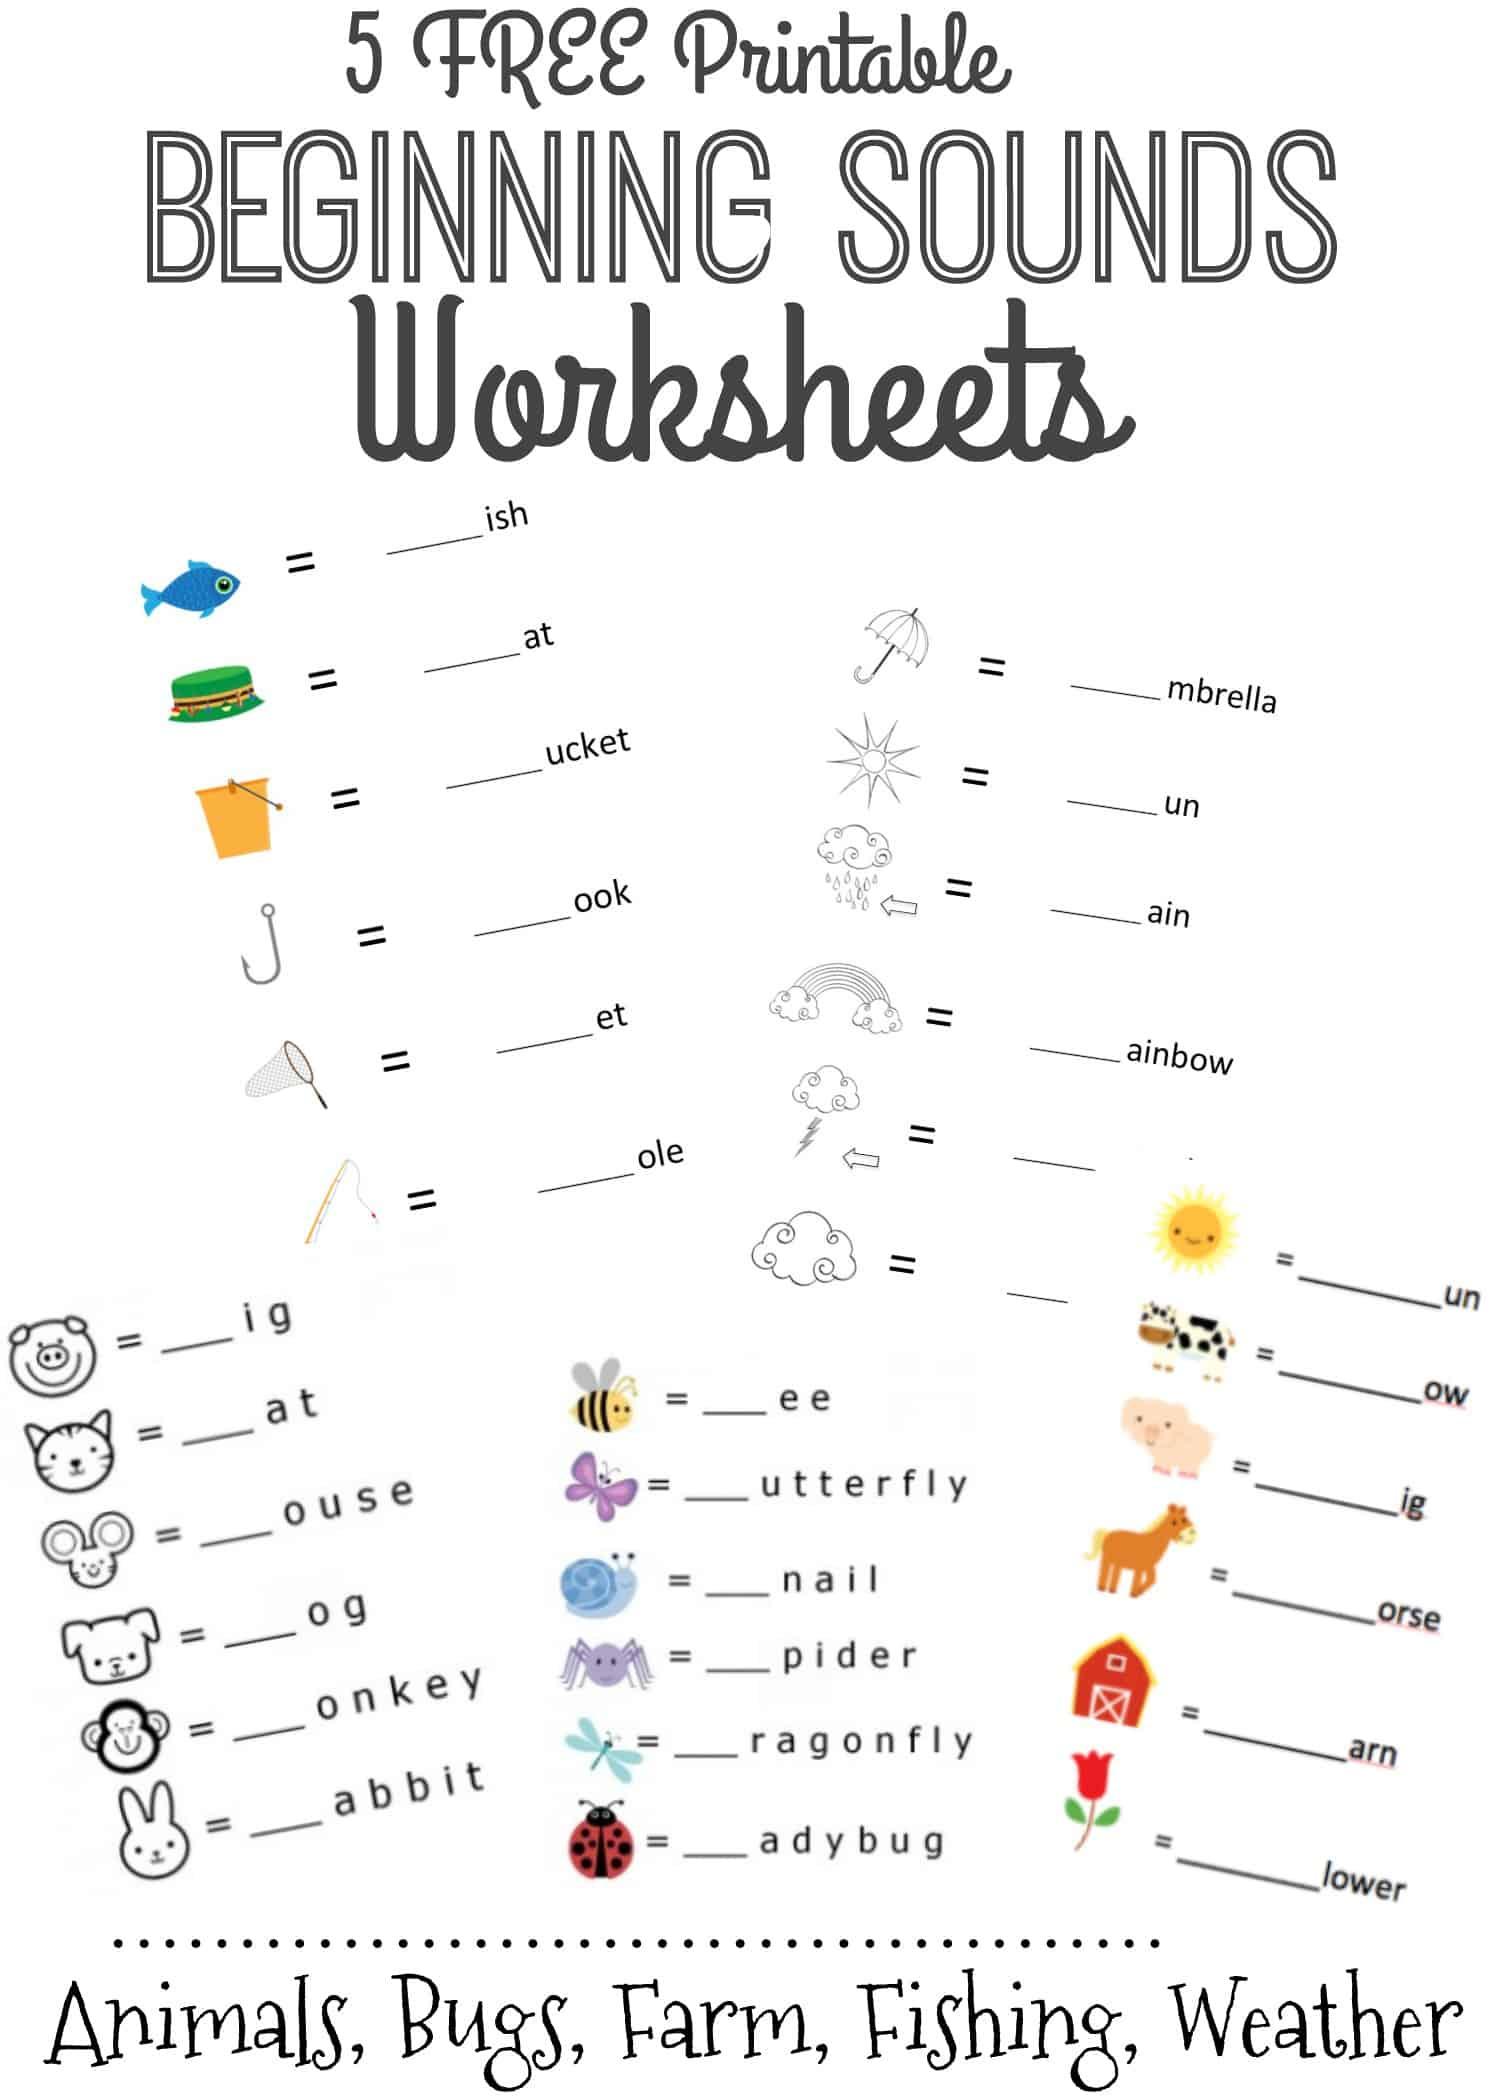 Beginning Sounds Letter Worksheets For Early Learners | Printable Beginning Sounds Worksheets